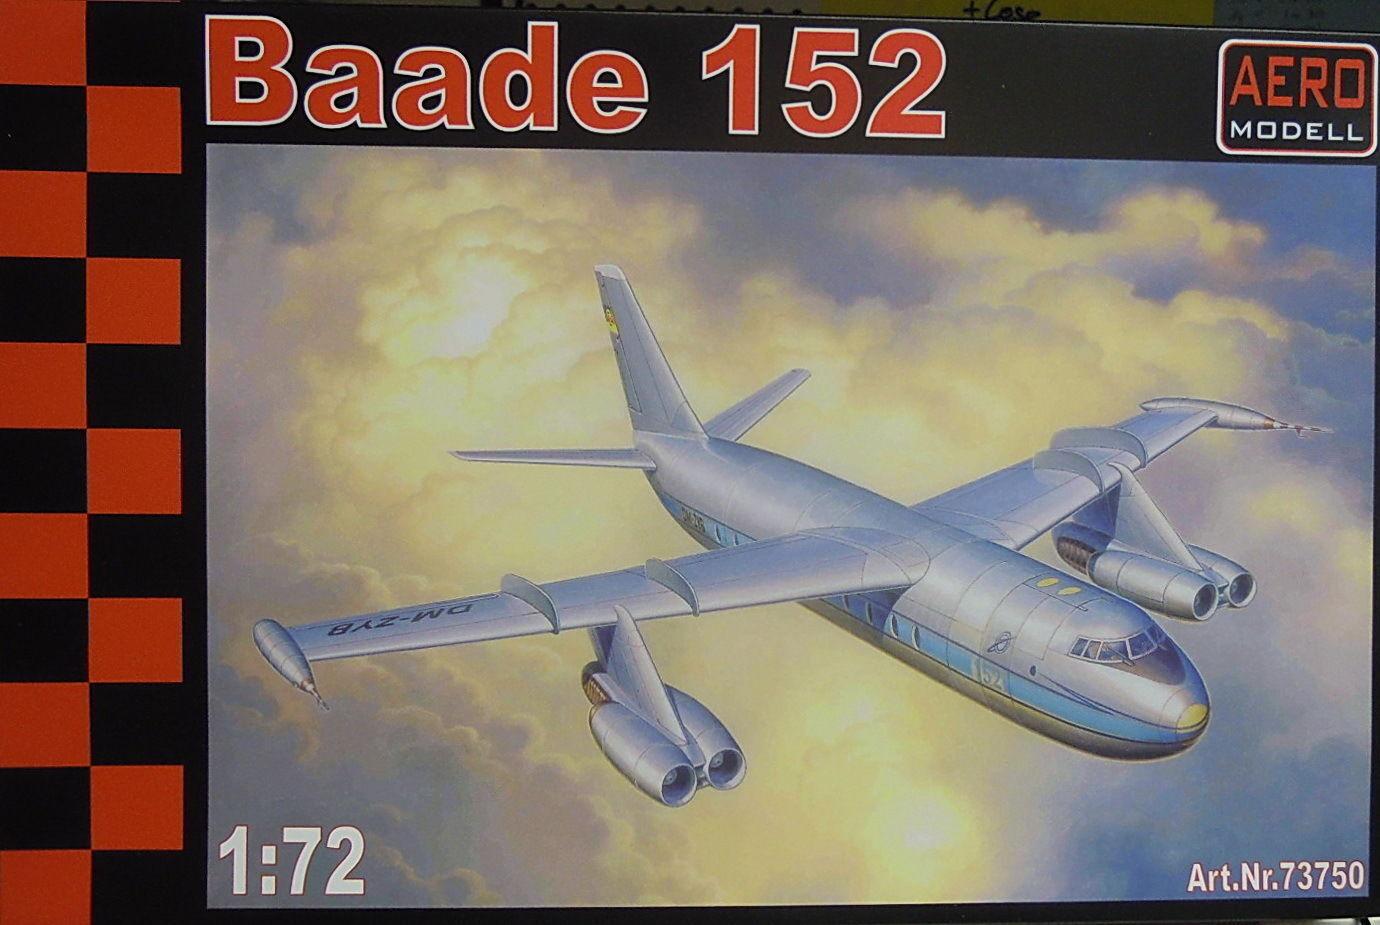 bienvenido a elegir Avión de Pasajeros Baade 152 152 152 V4, Aeromodell, 1 72 , Avión de Pasajeros, Rareza  Venta en línea de descuento de fábrica